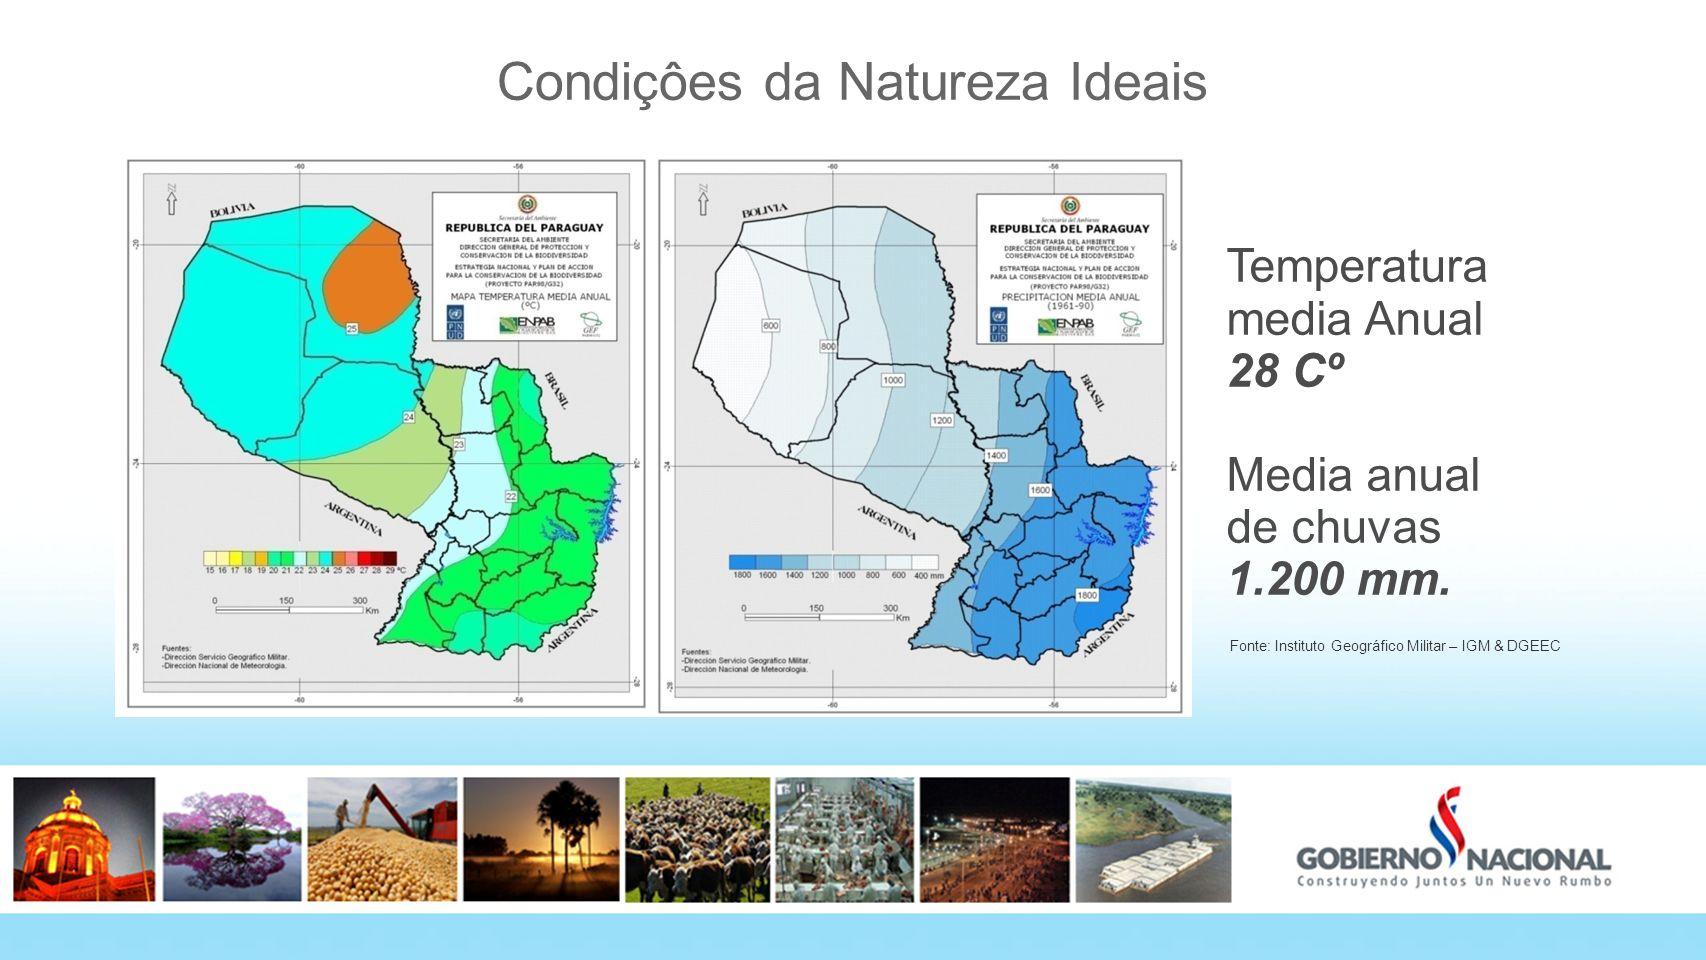 Condiçôes da Natureza Ideais